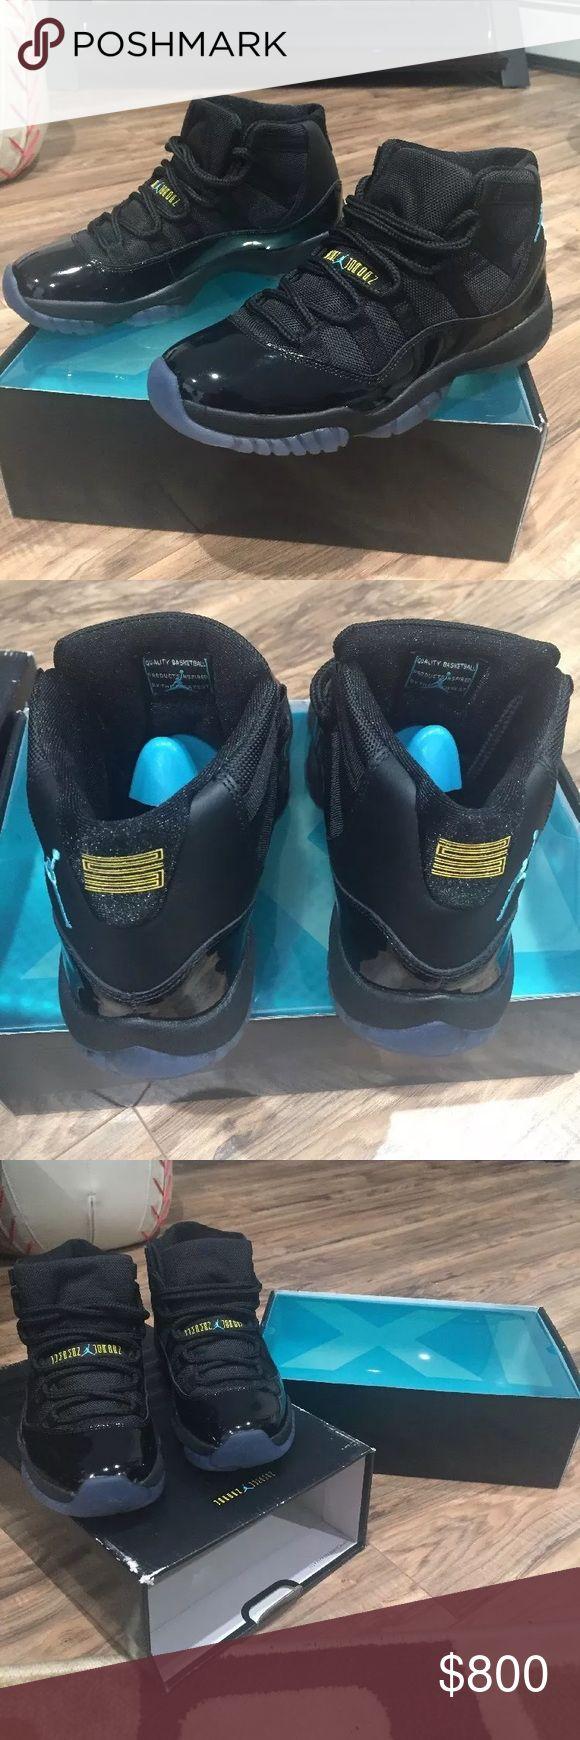 Jordan 11 gamma blue size 7.5 rare size Authentic Jordan 11 ds pair Jordan Shoes Sneakers